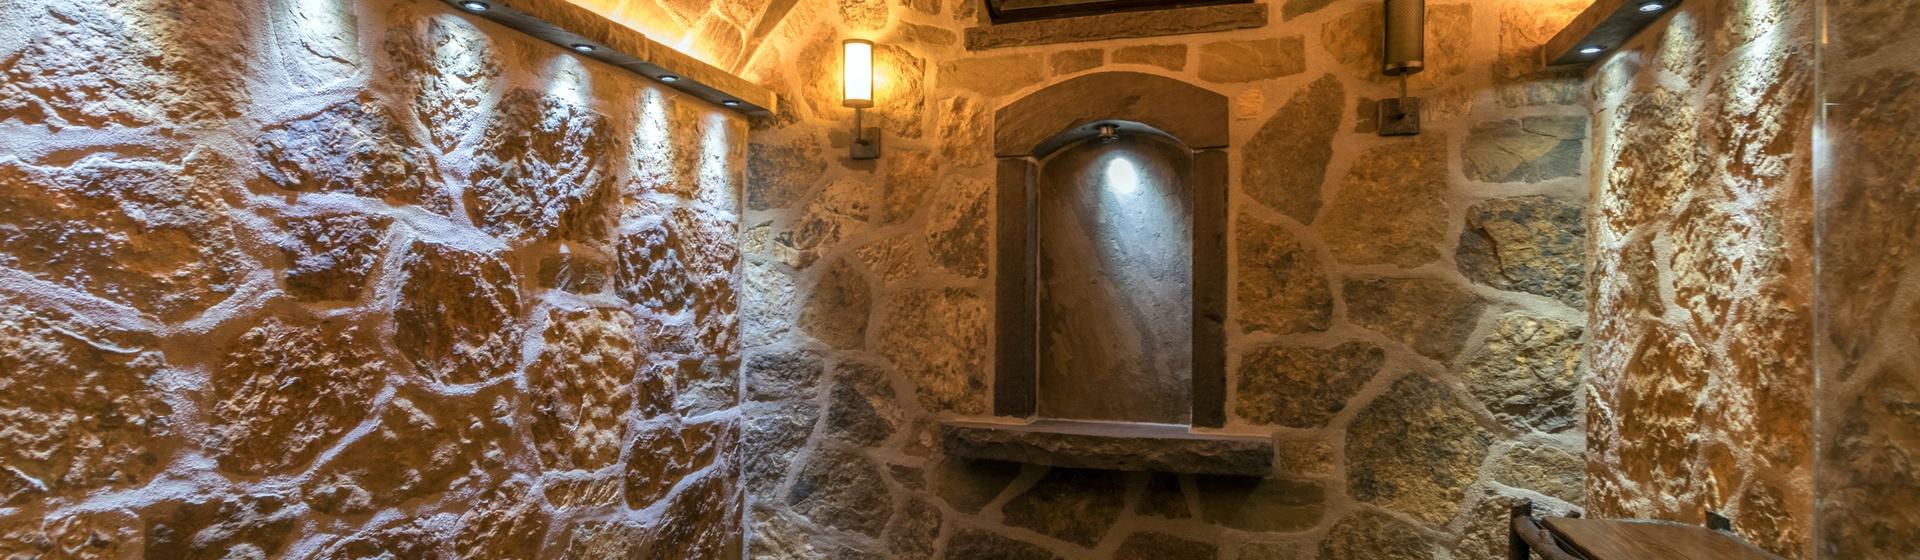 6.07-mountain-village-hood-park-manor-wine-cellar-track.JPG